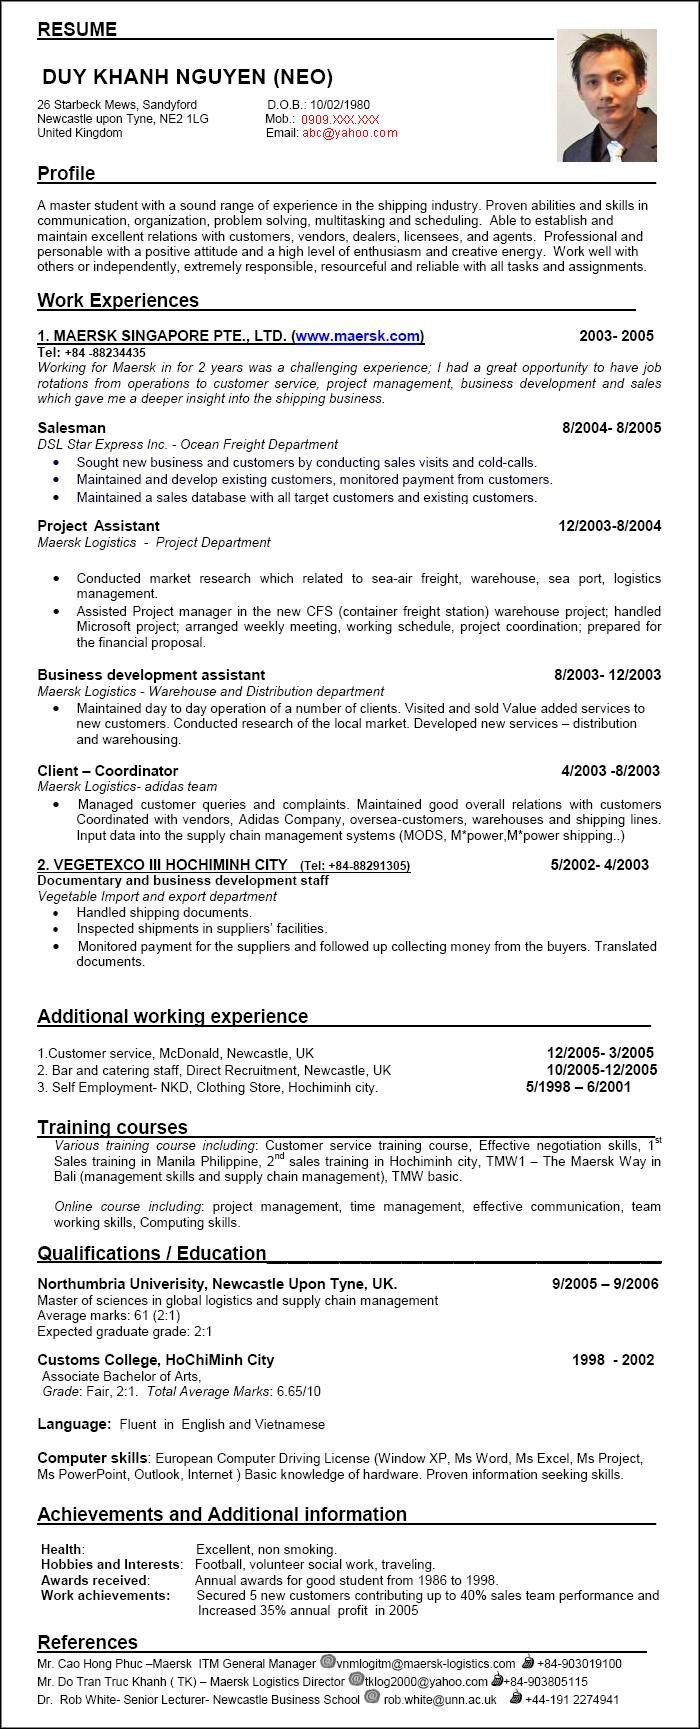 resume chief engineer engineer resume engineering manager resume gallery images of chief engineer resume success